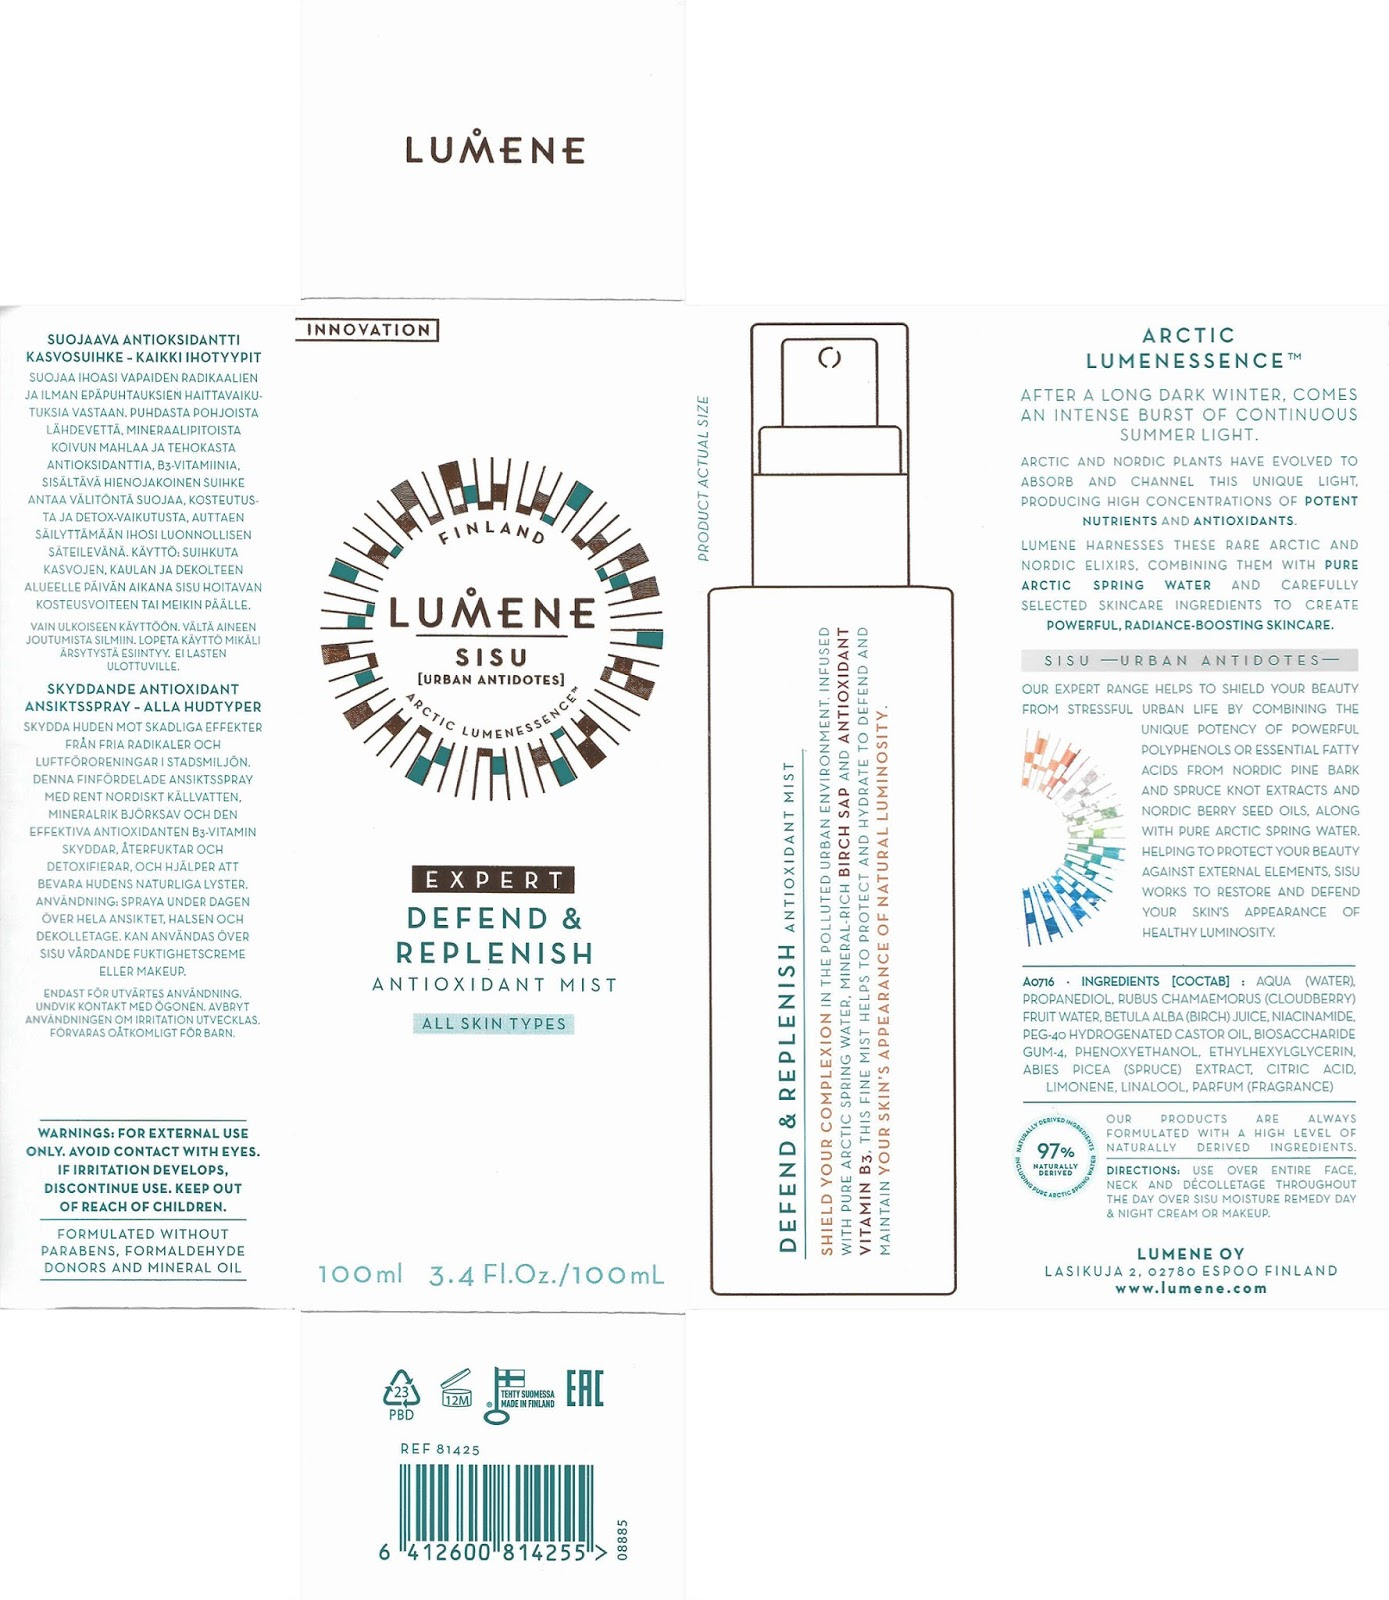 lavlilacs LUMENE Sisu Urban Antidotes Defend & Replenish Antioxidant Mist packaging